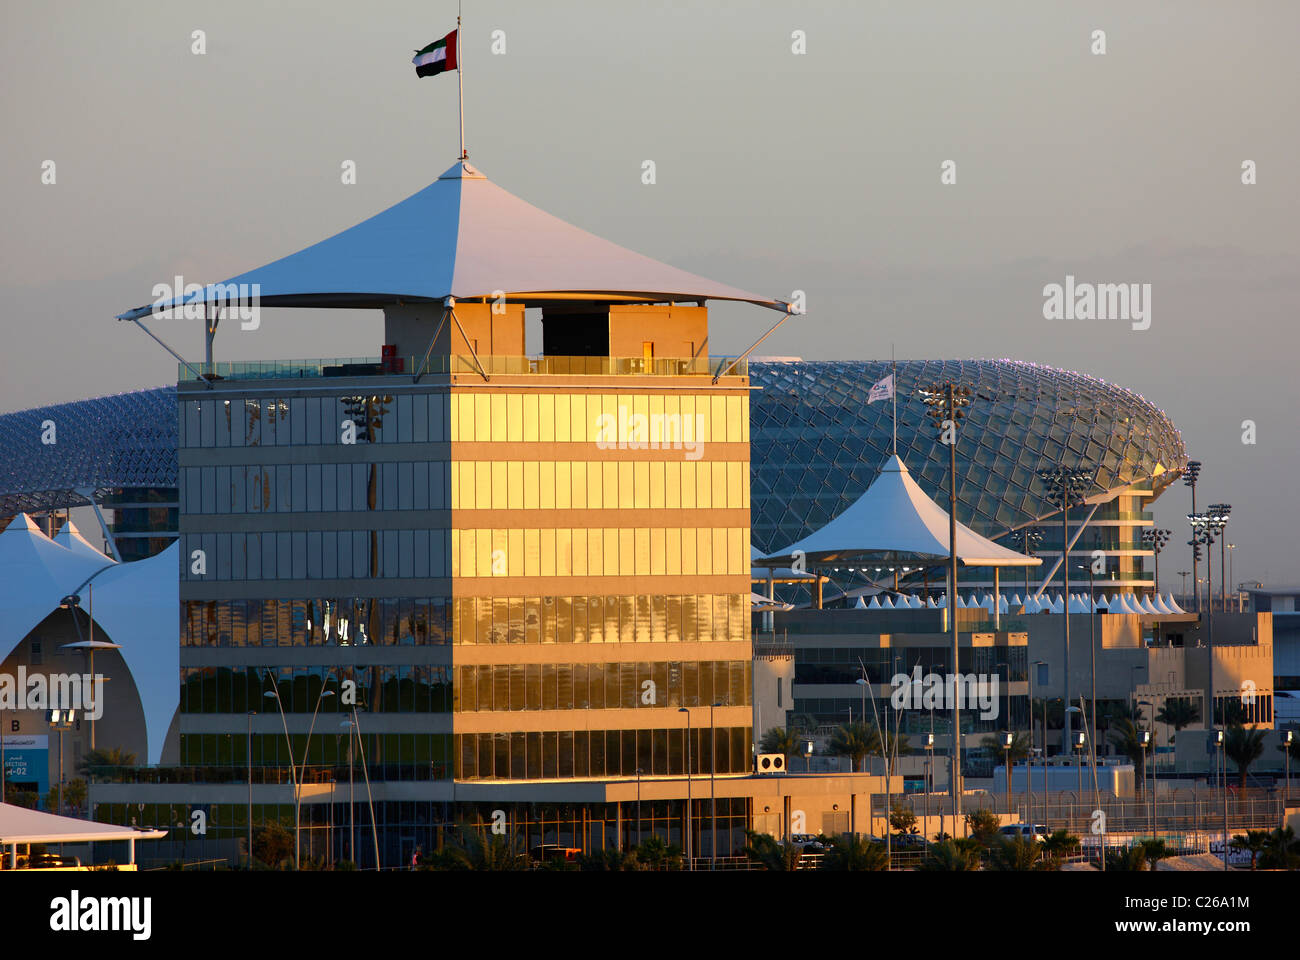 Yas Hotel, a Yas Island, parte della gara di Formula Uno via, hotel design a Yas-Island, Abu Dhabi Emirati Arabi Immagini Stock